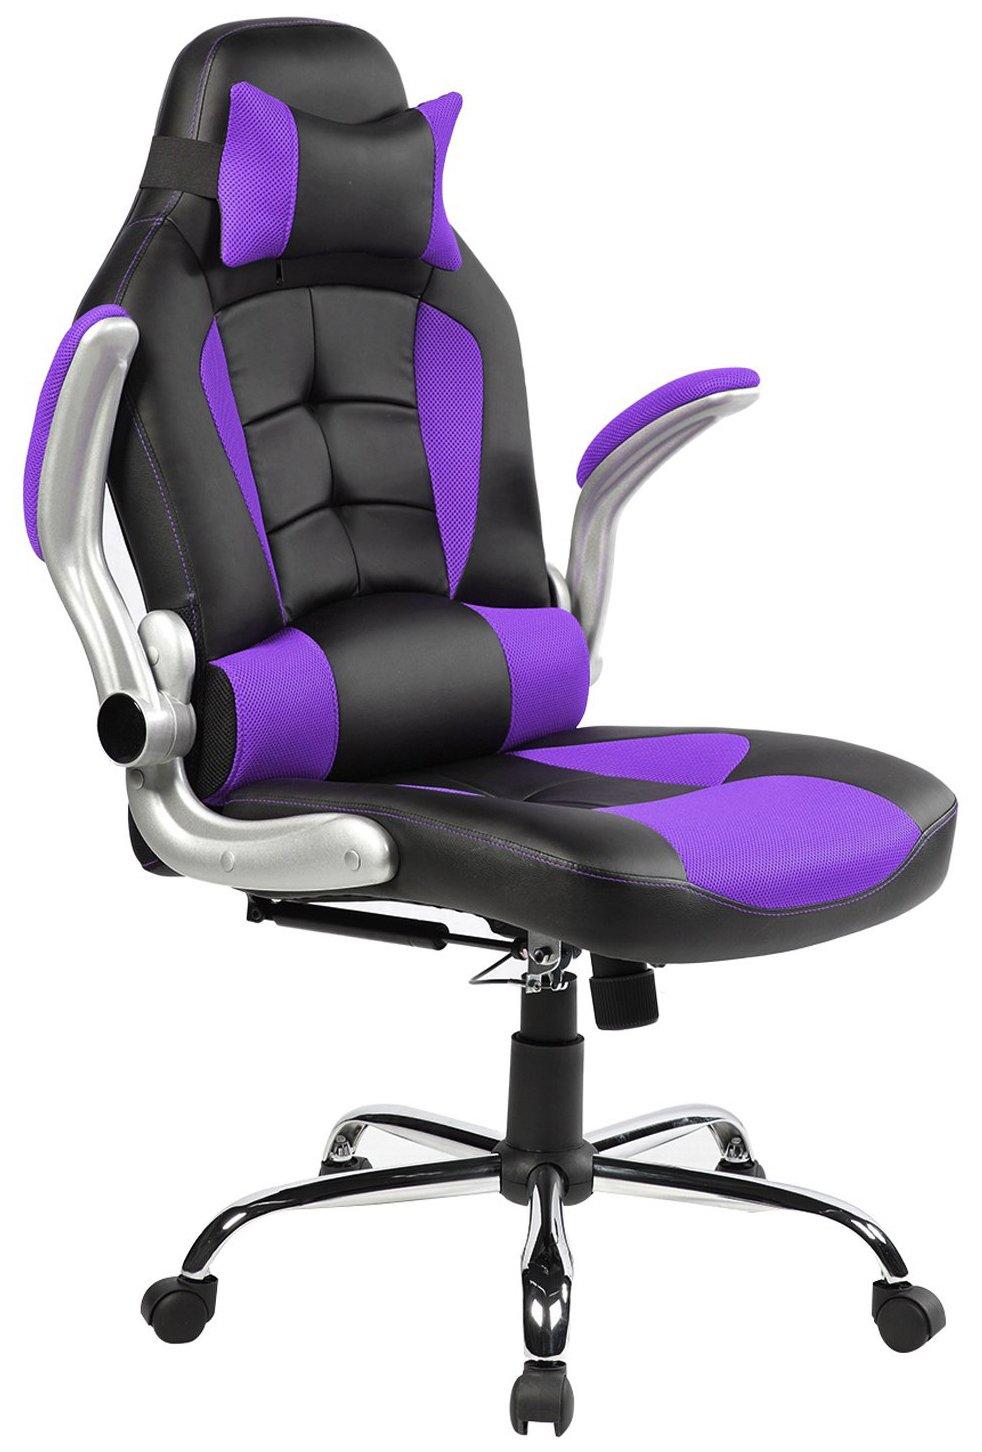 Amazoncom Merax King Series High Back Ergonomic Pu Leather Office